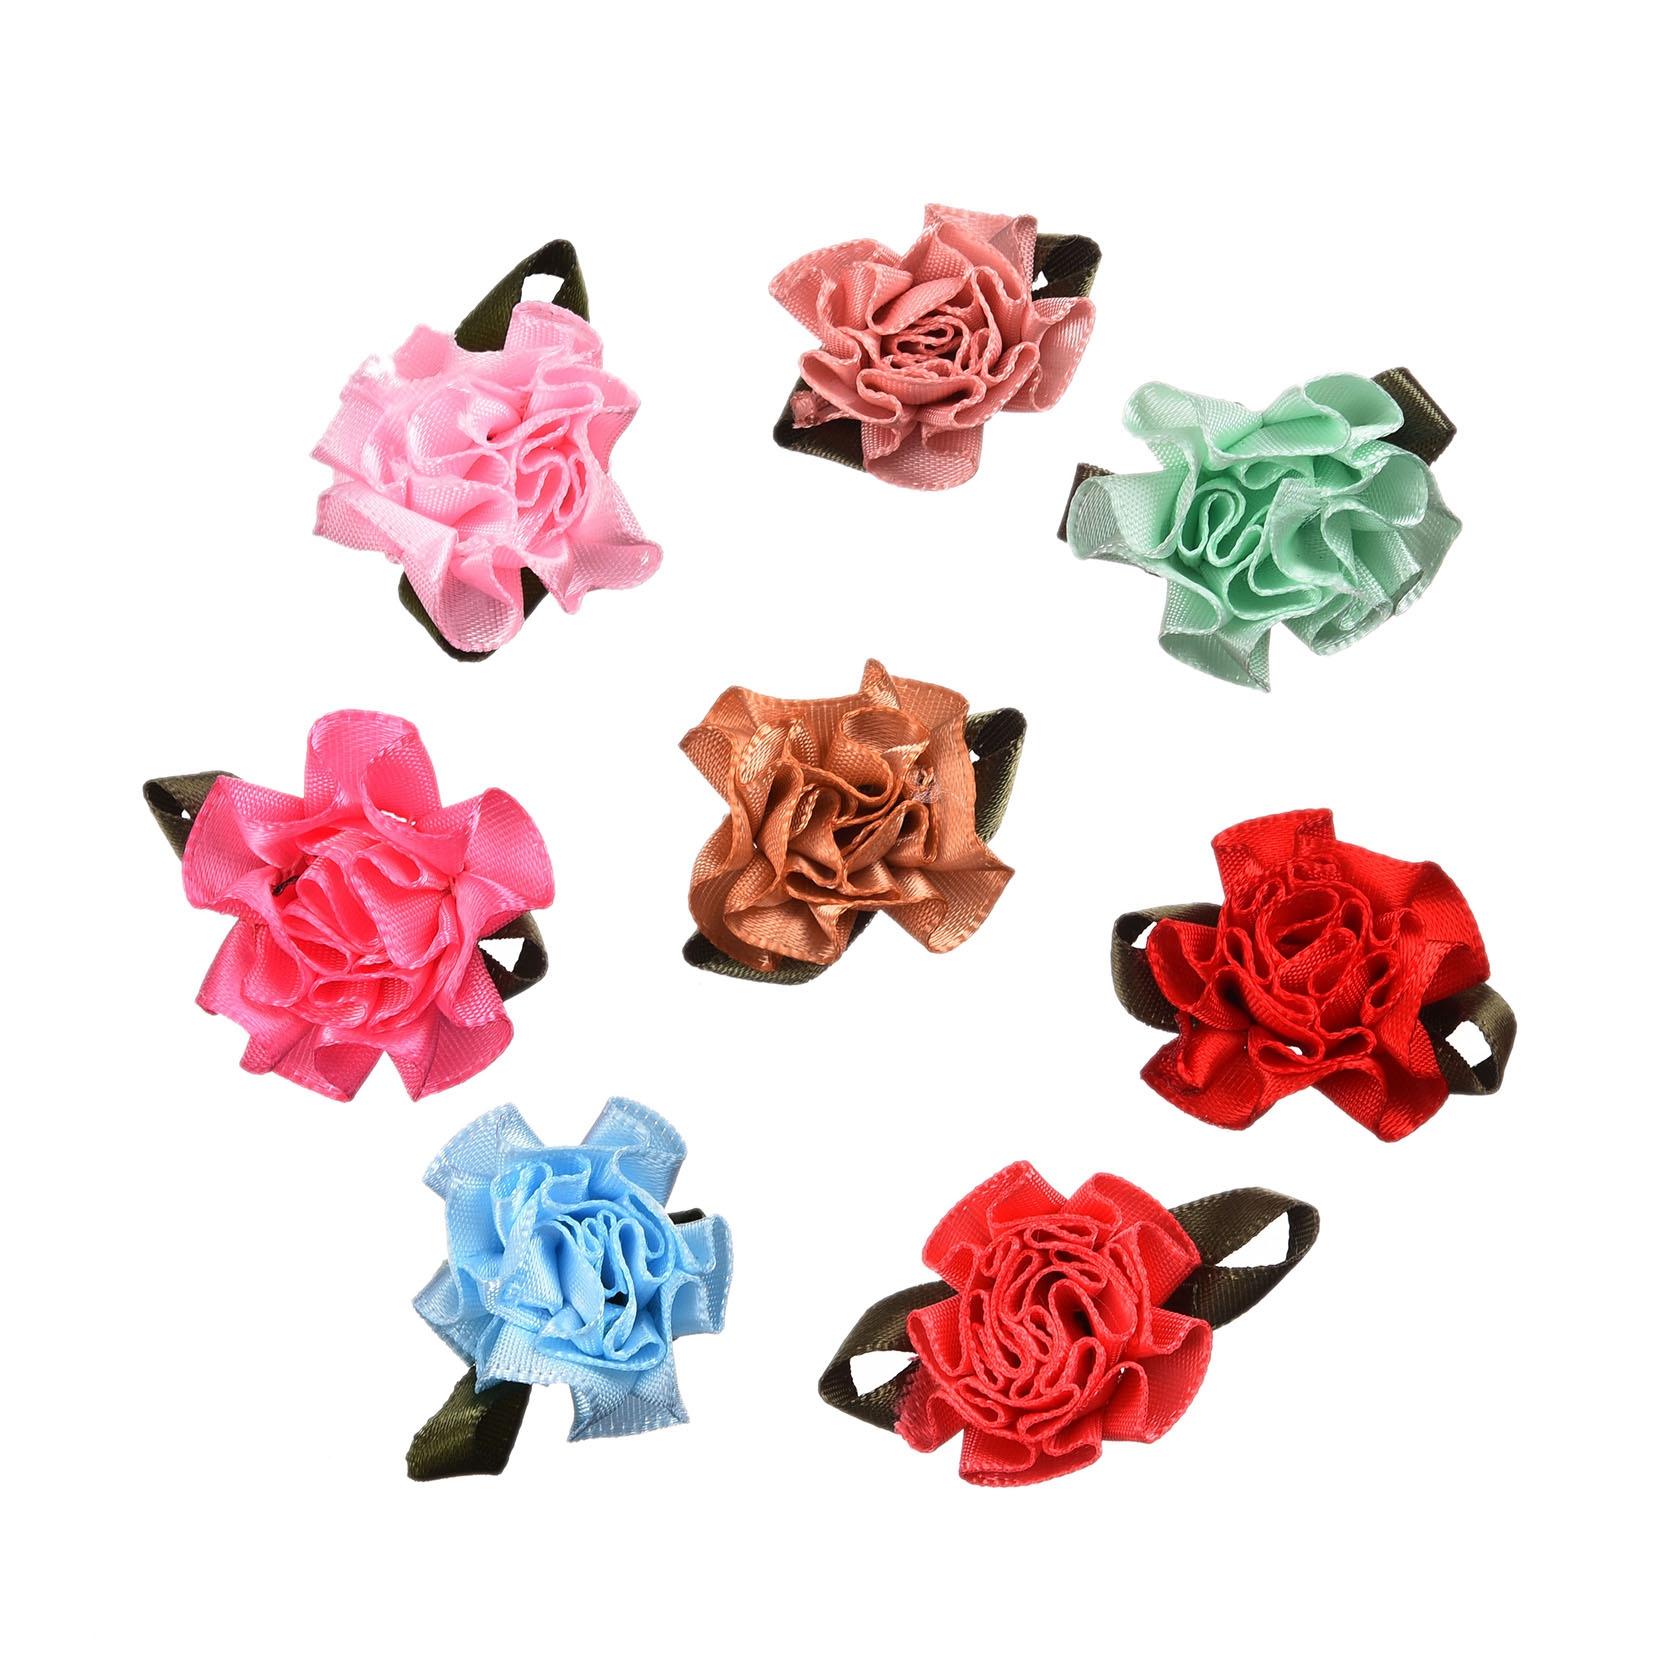 50pcs mixed satin ribbon fabric flowers applique diy craft for Applique decoration